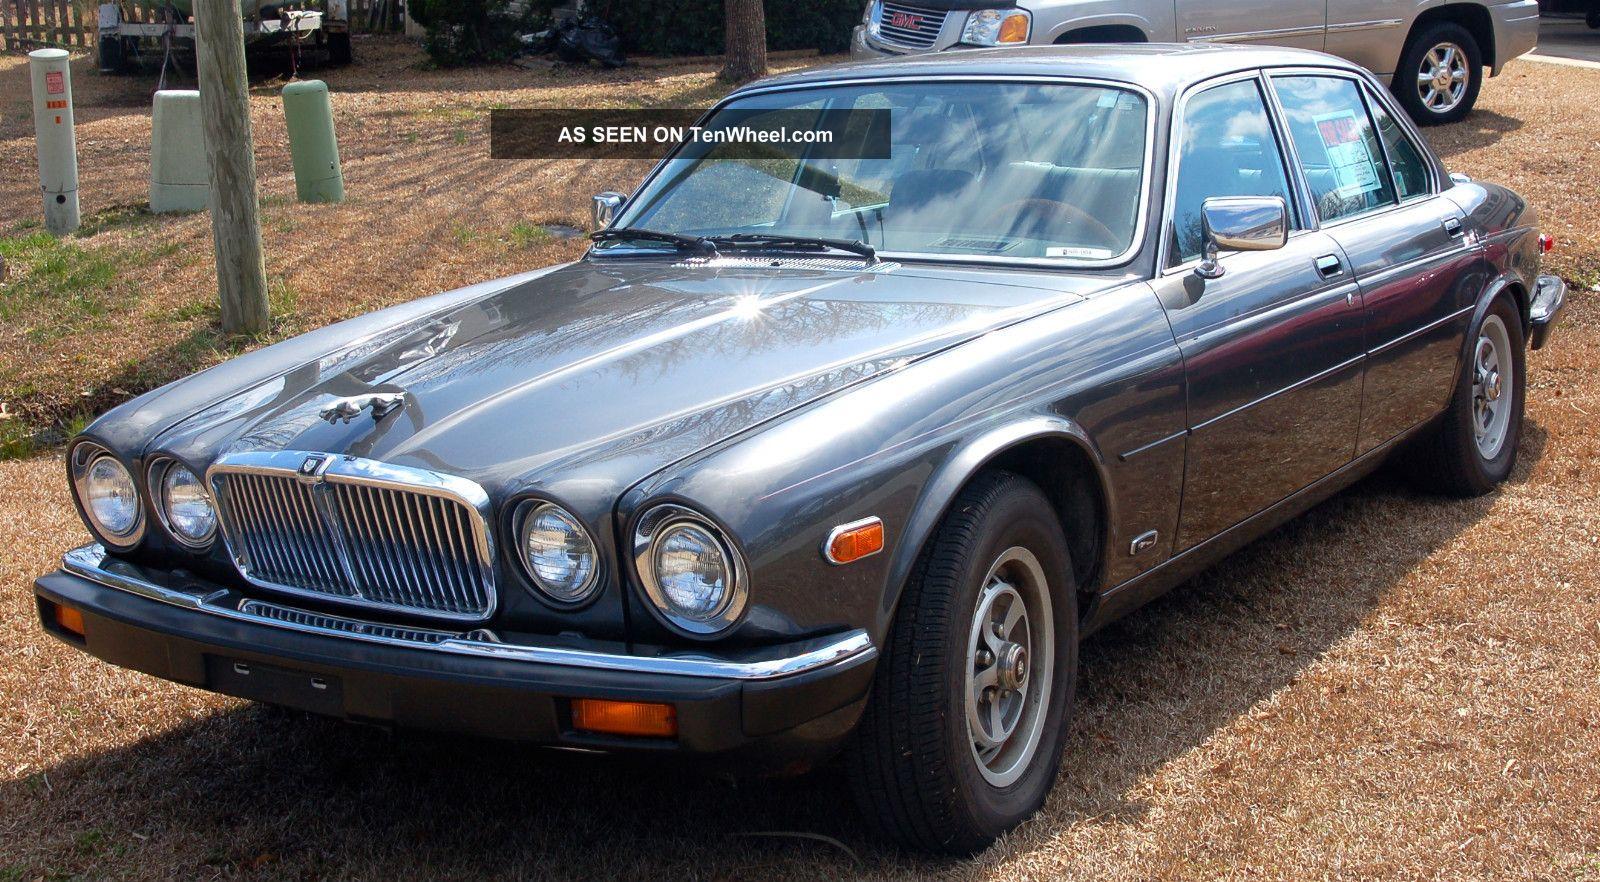 1987 Jaguar Xj6 XJ6 photo